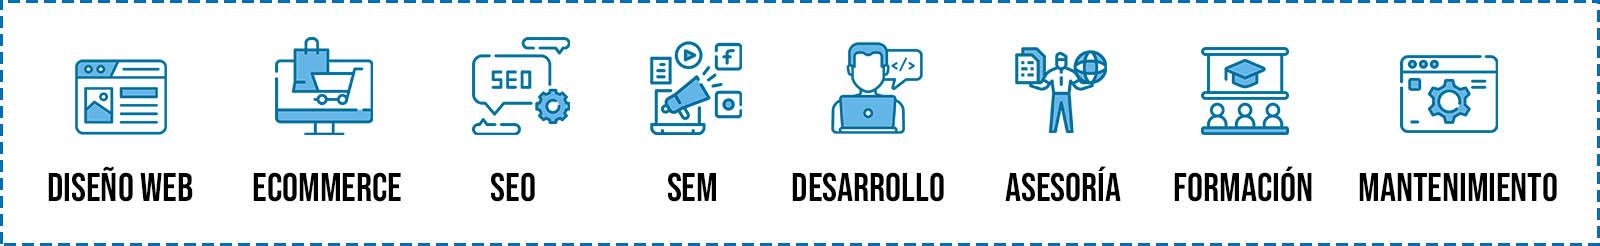 Leyenda proyectos web easymode marketing desktop